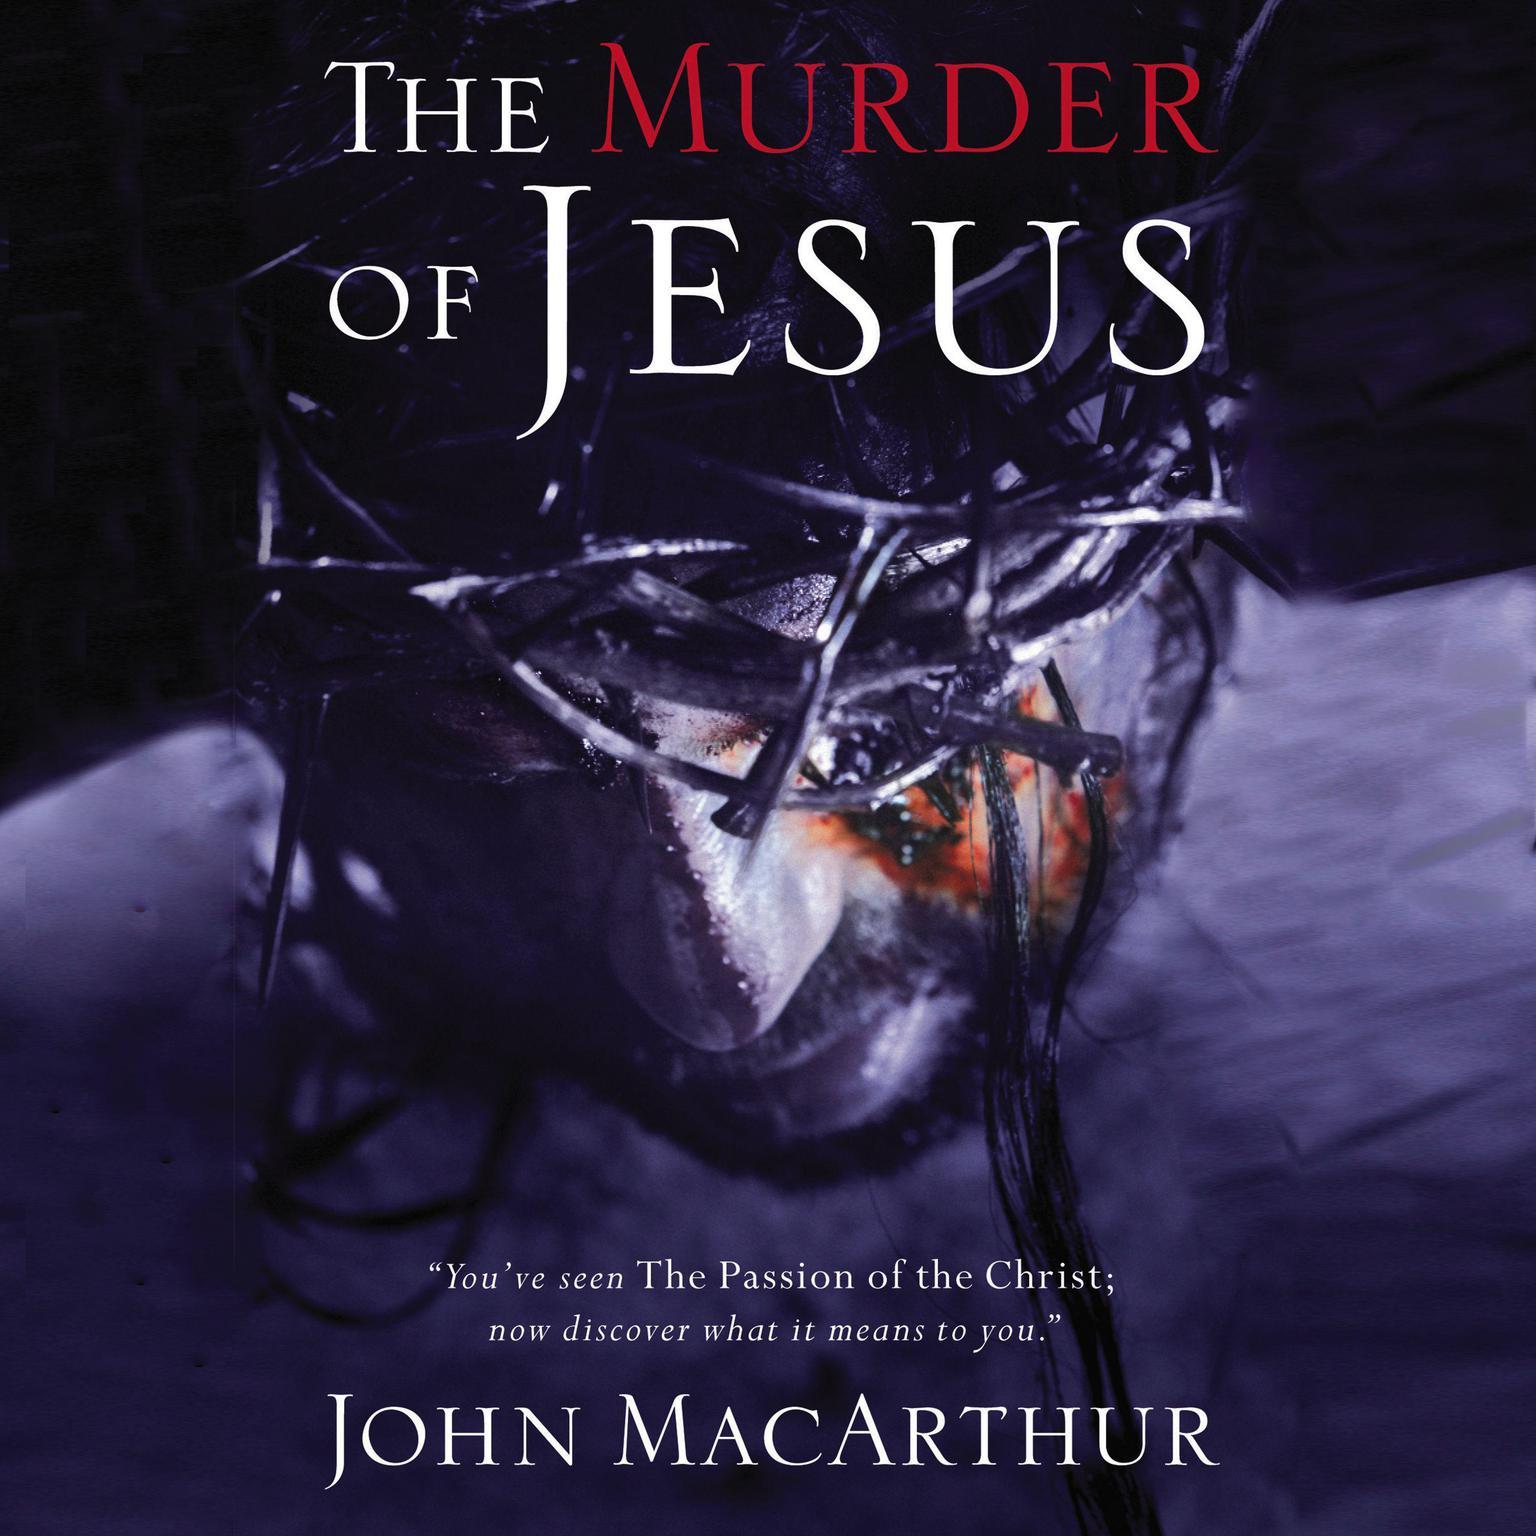 The Murder of Jesus Audiobook, by John F. MacArthur